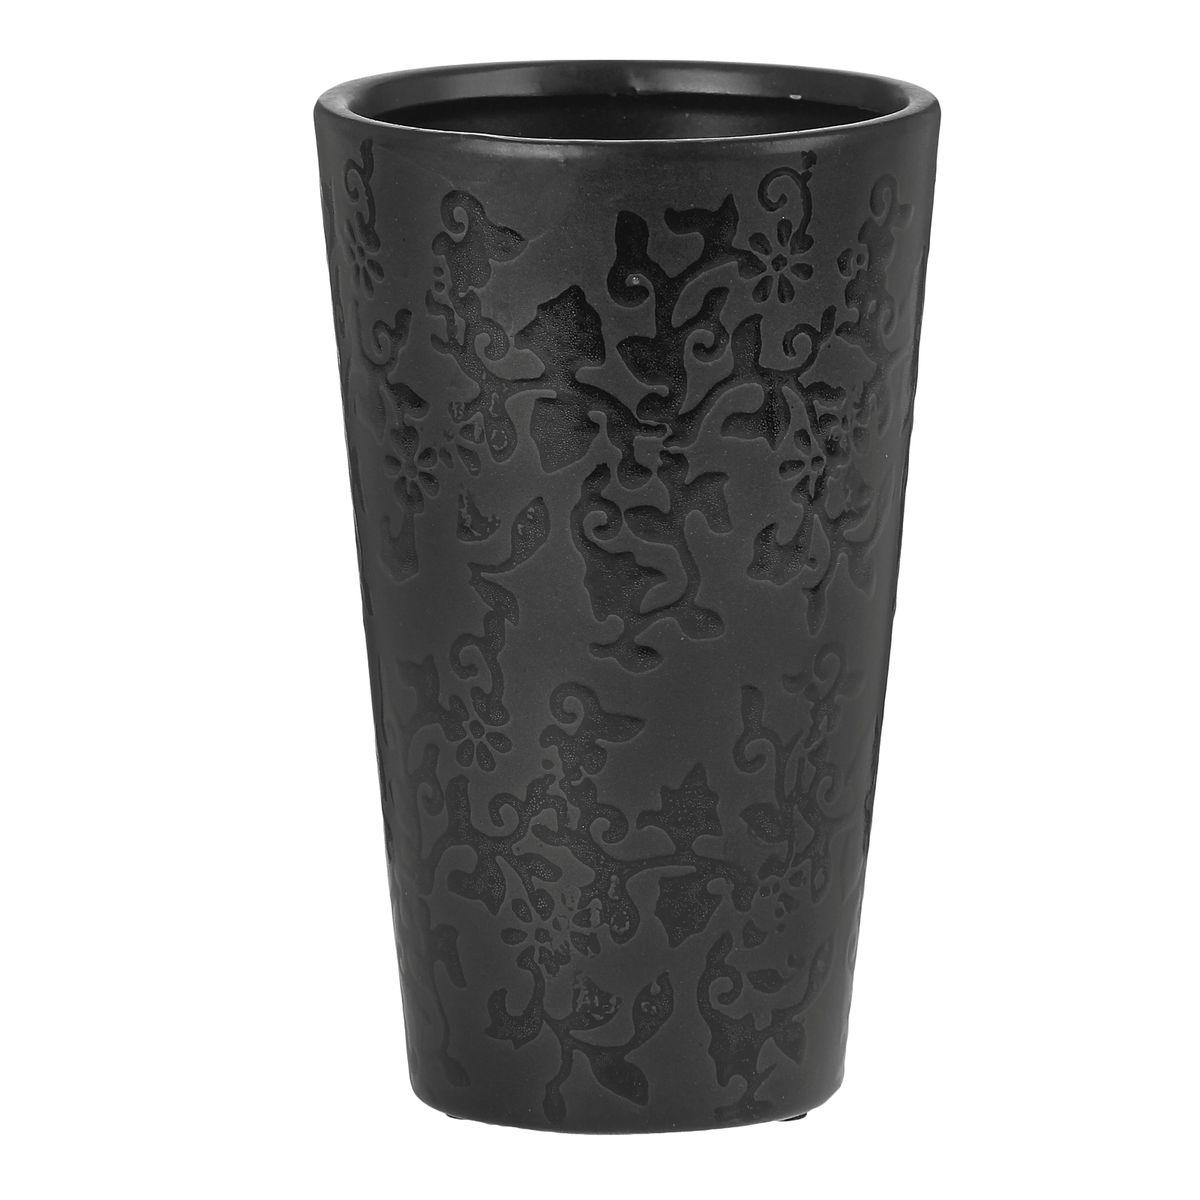 Ваза керамика кружева 19,5*12 см 863609863609Керамика